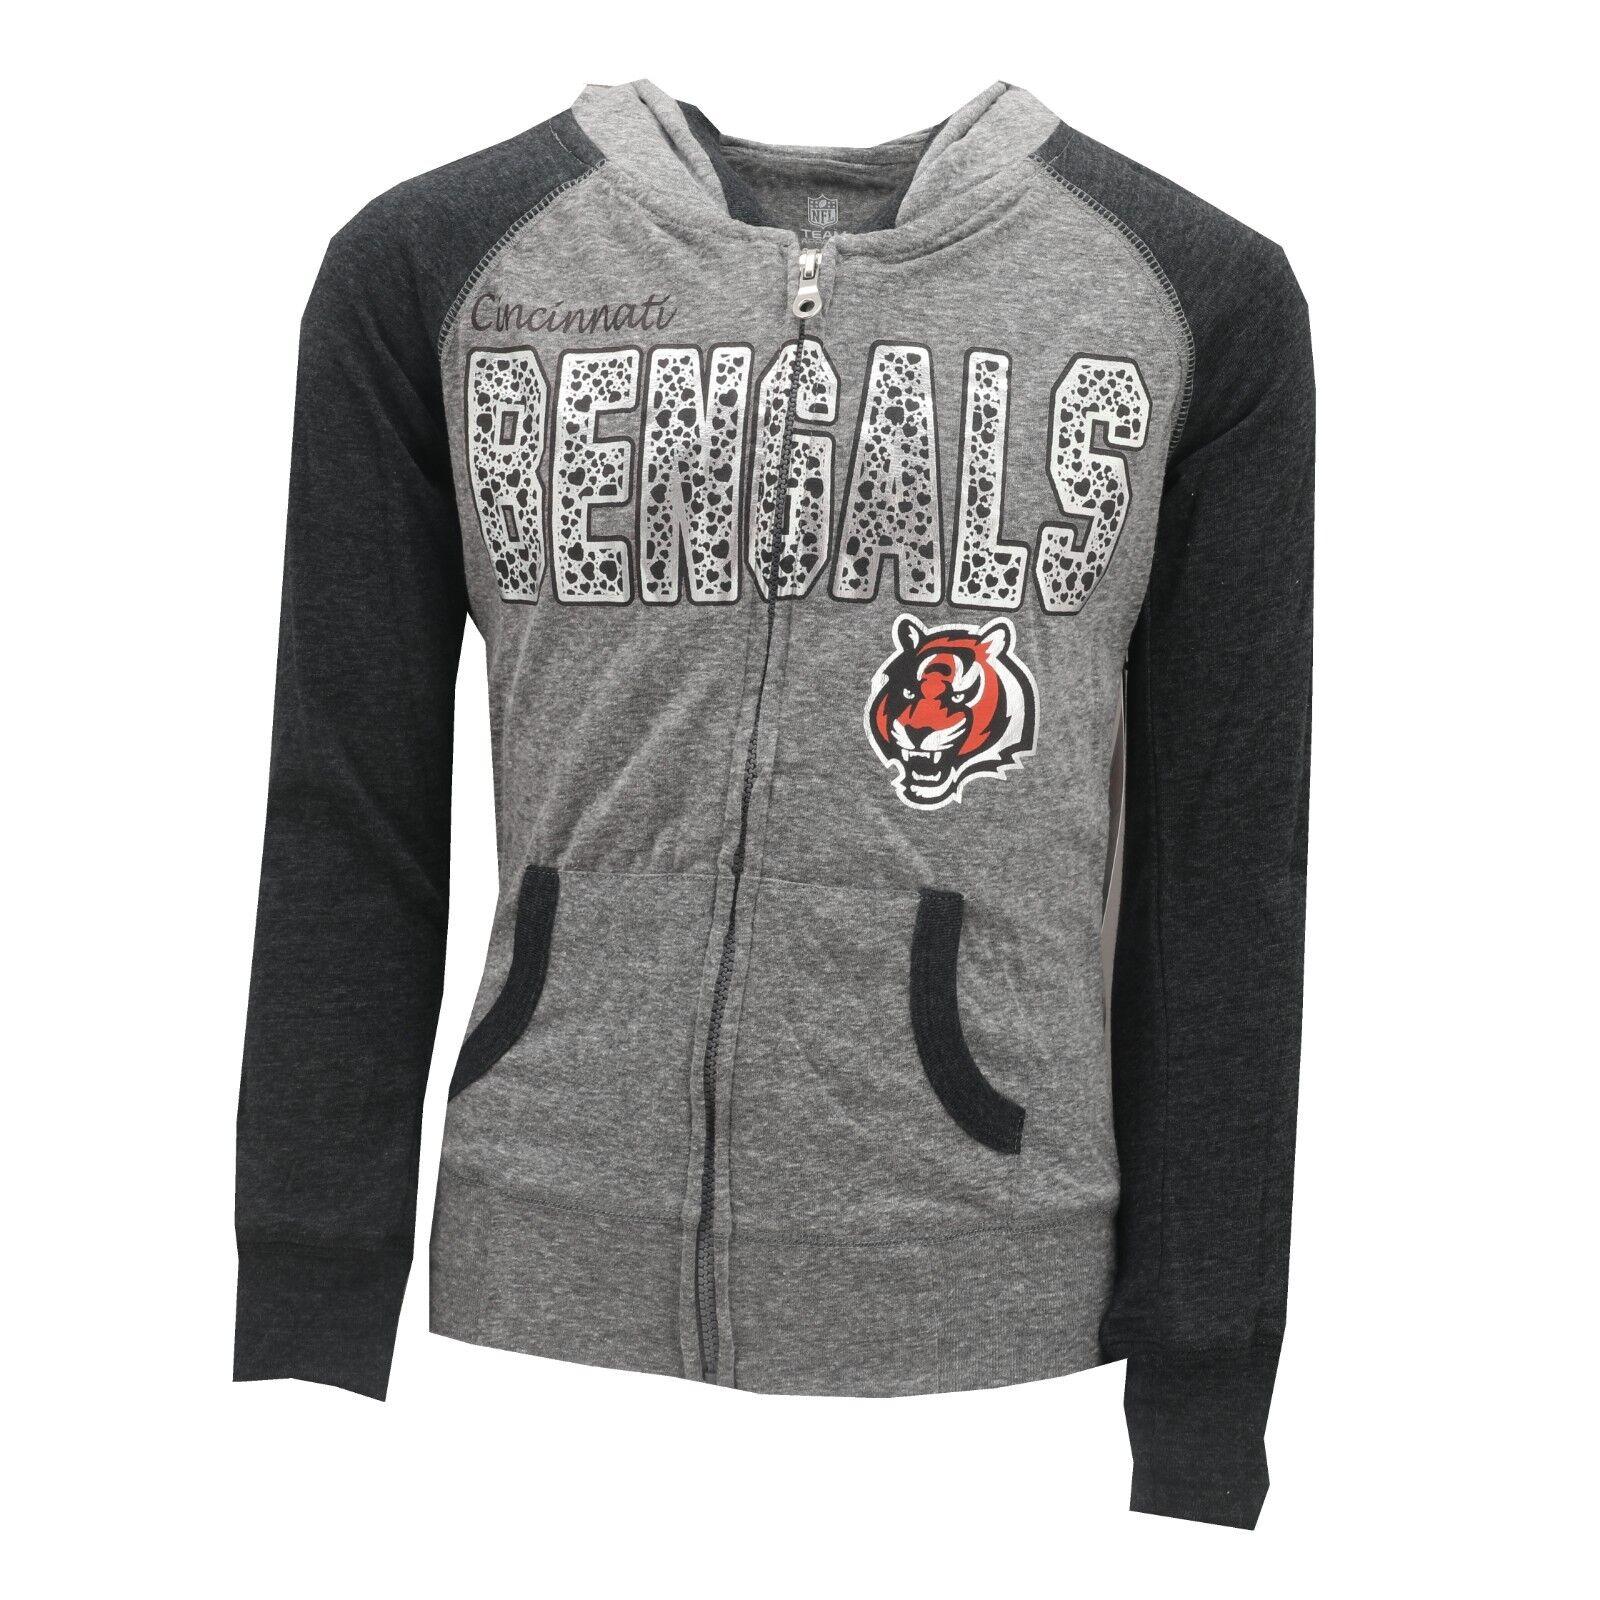 buy popular 8bb44 c16e6 Details about Cincinnati Bengals Official NFL Kids Youth Girls Light Hooded  Sweatshirt New